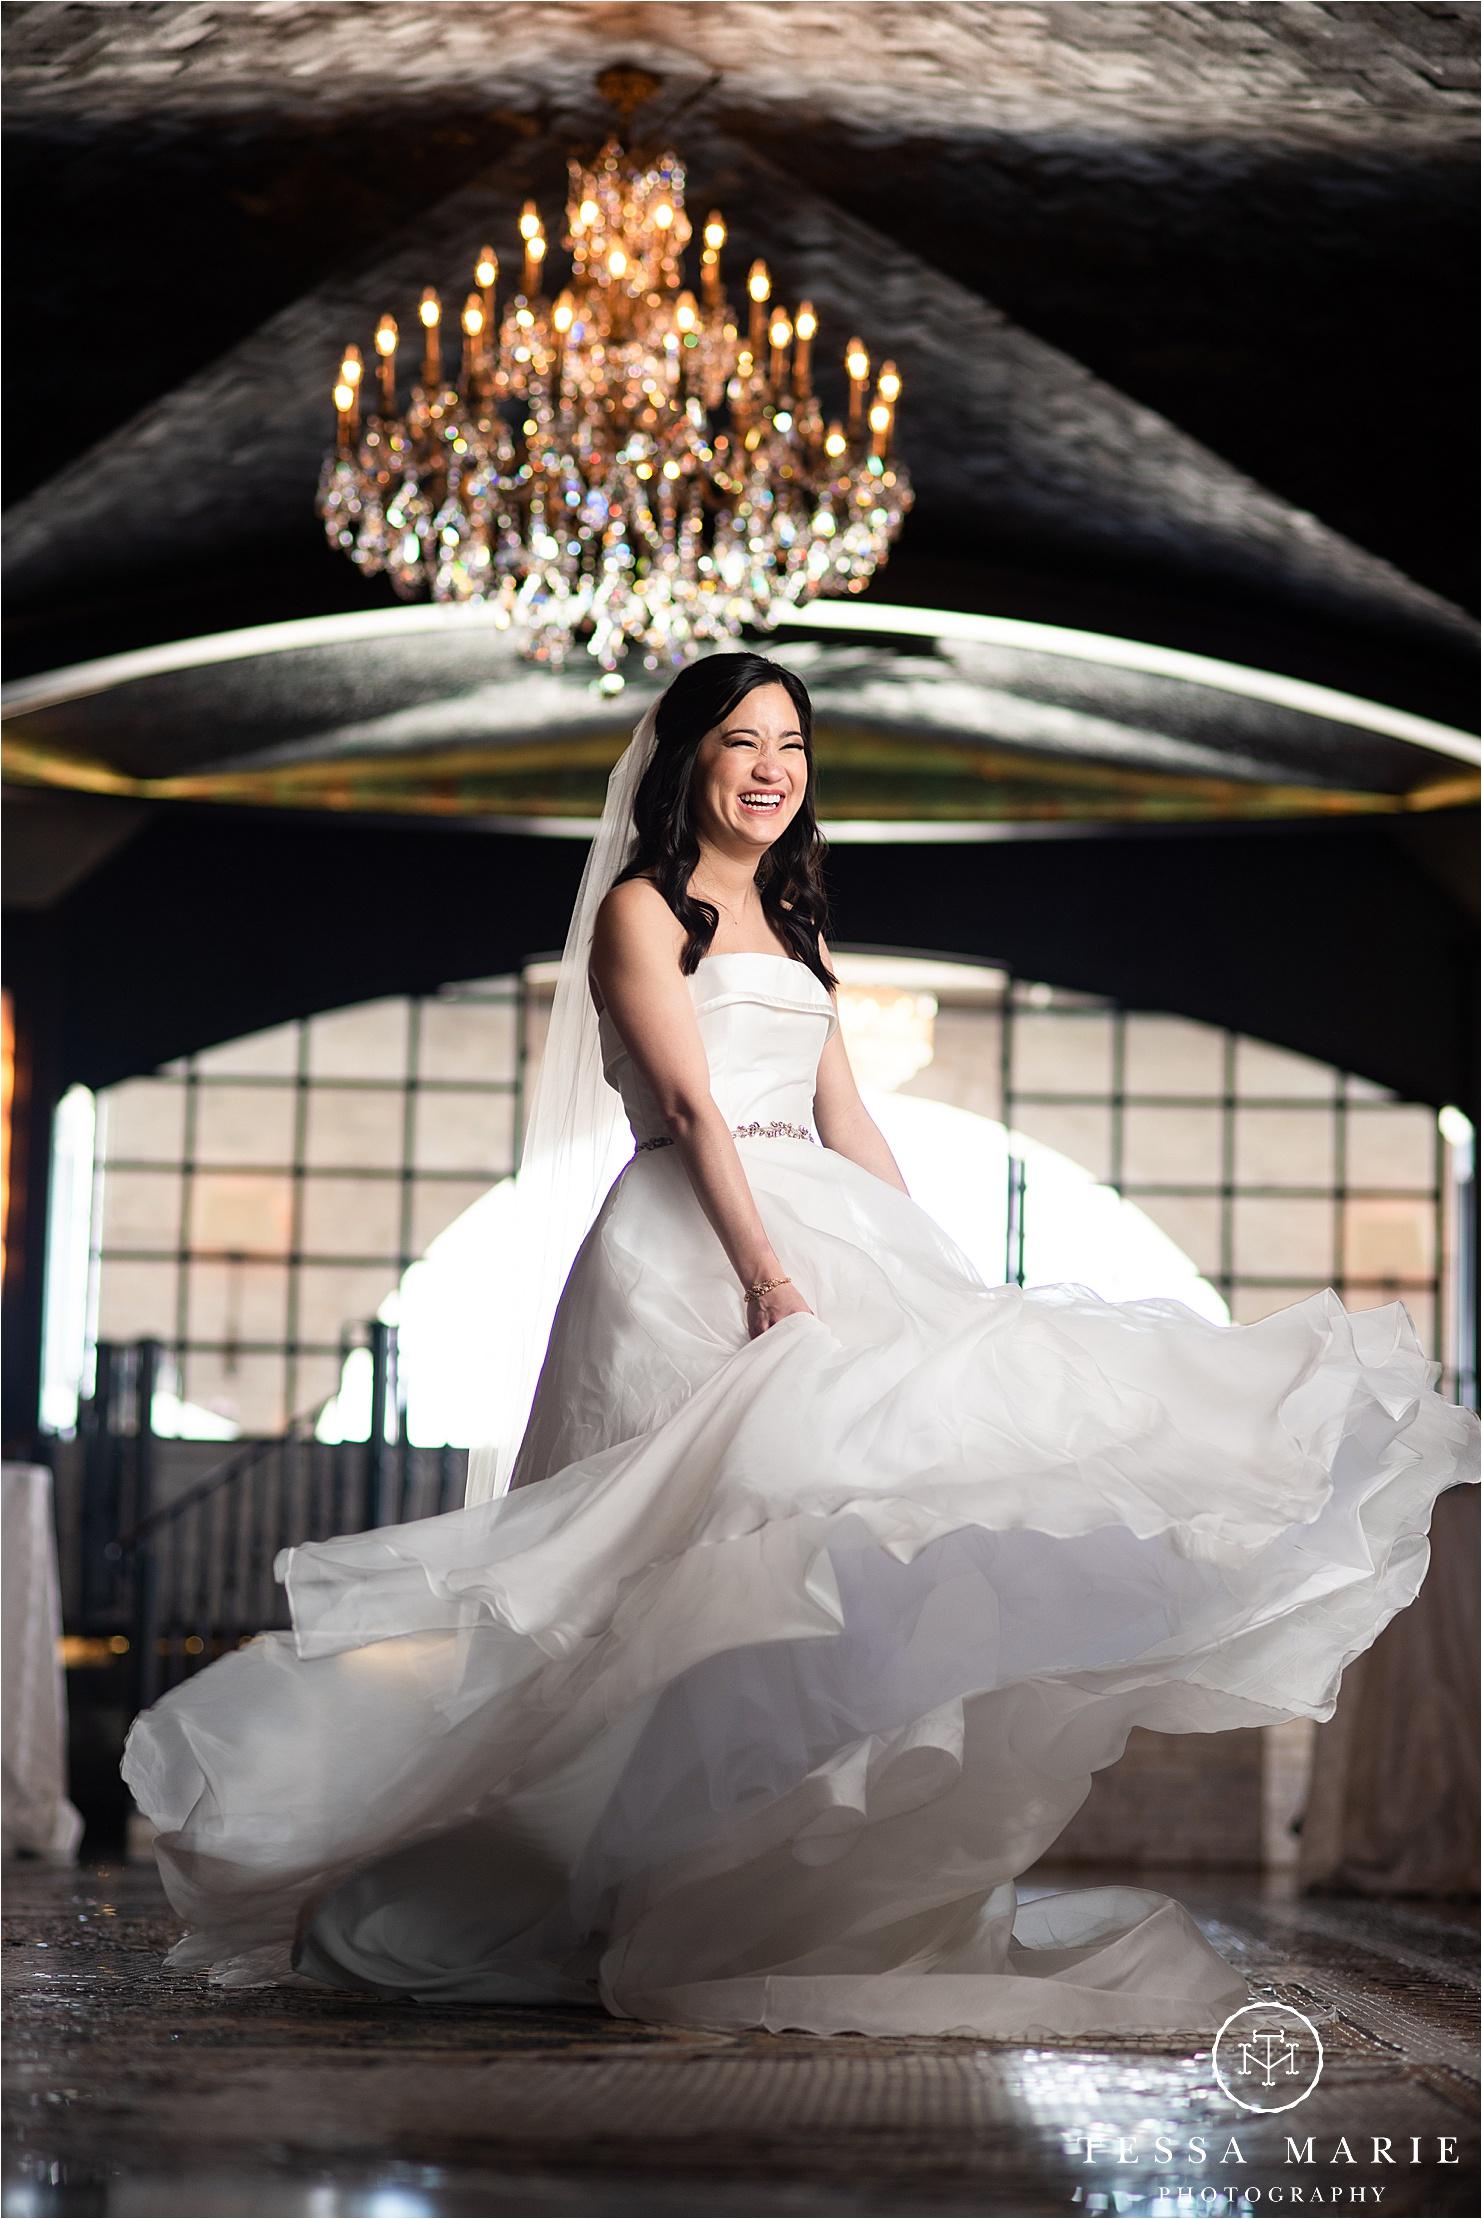 Tessa_marie_weddings_houston_wedding_photographer_The_astorian_0073.jpg